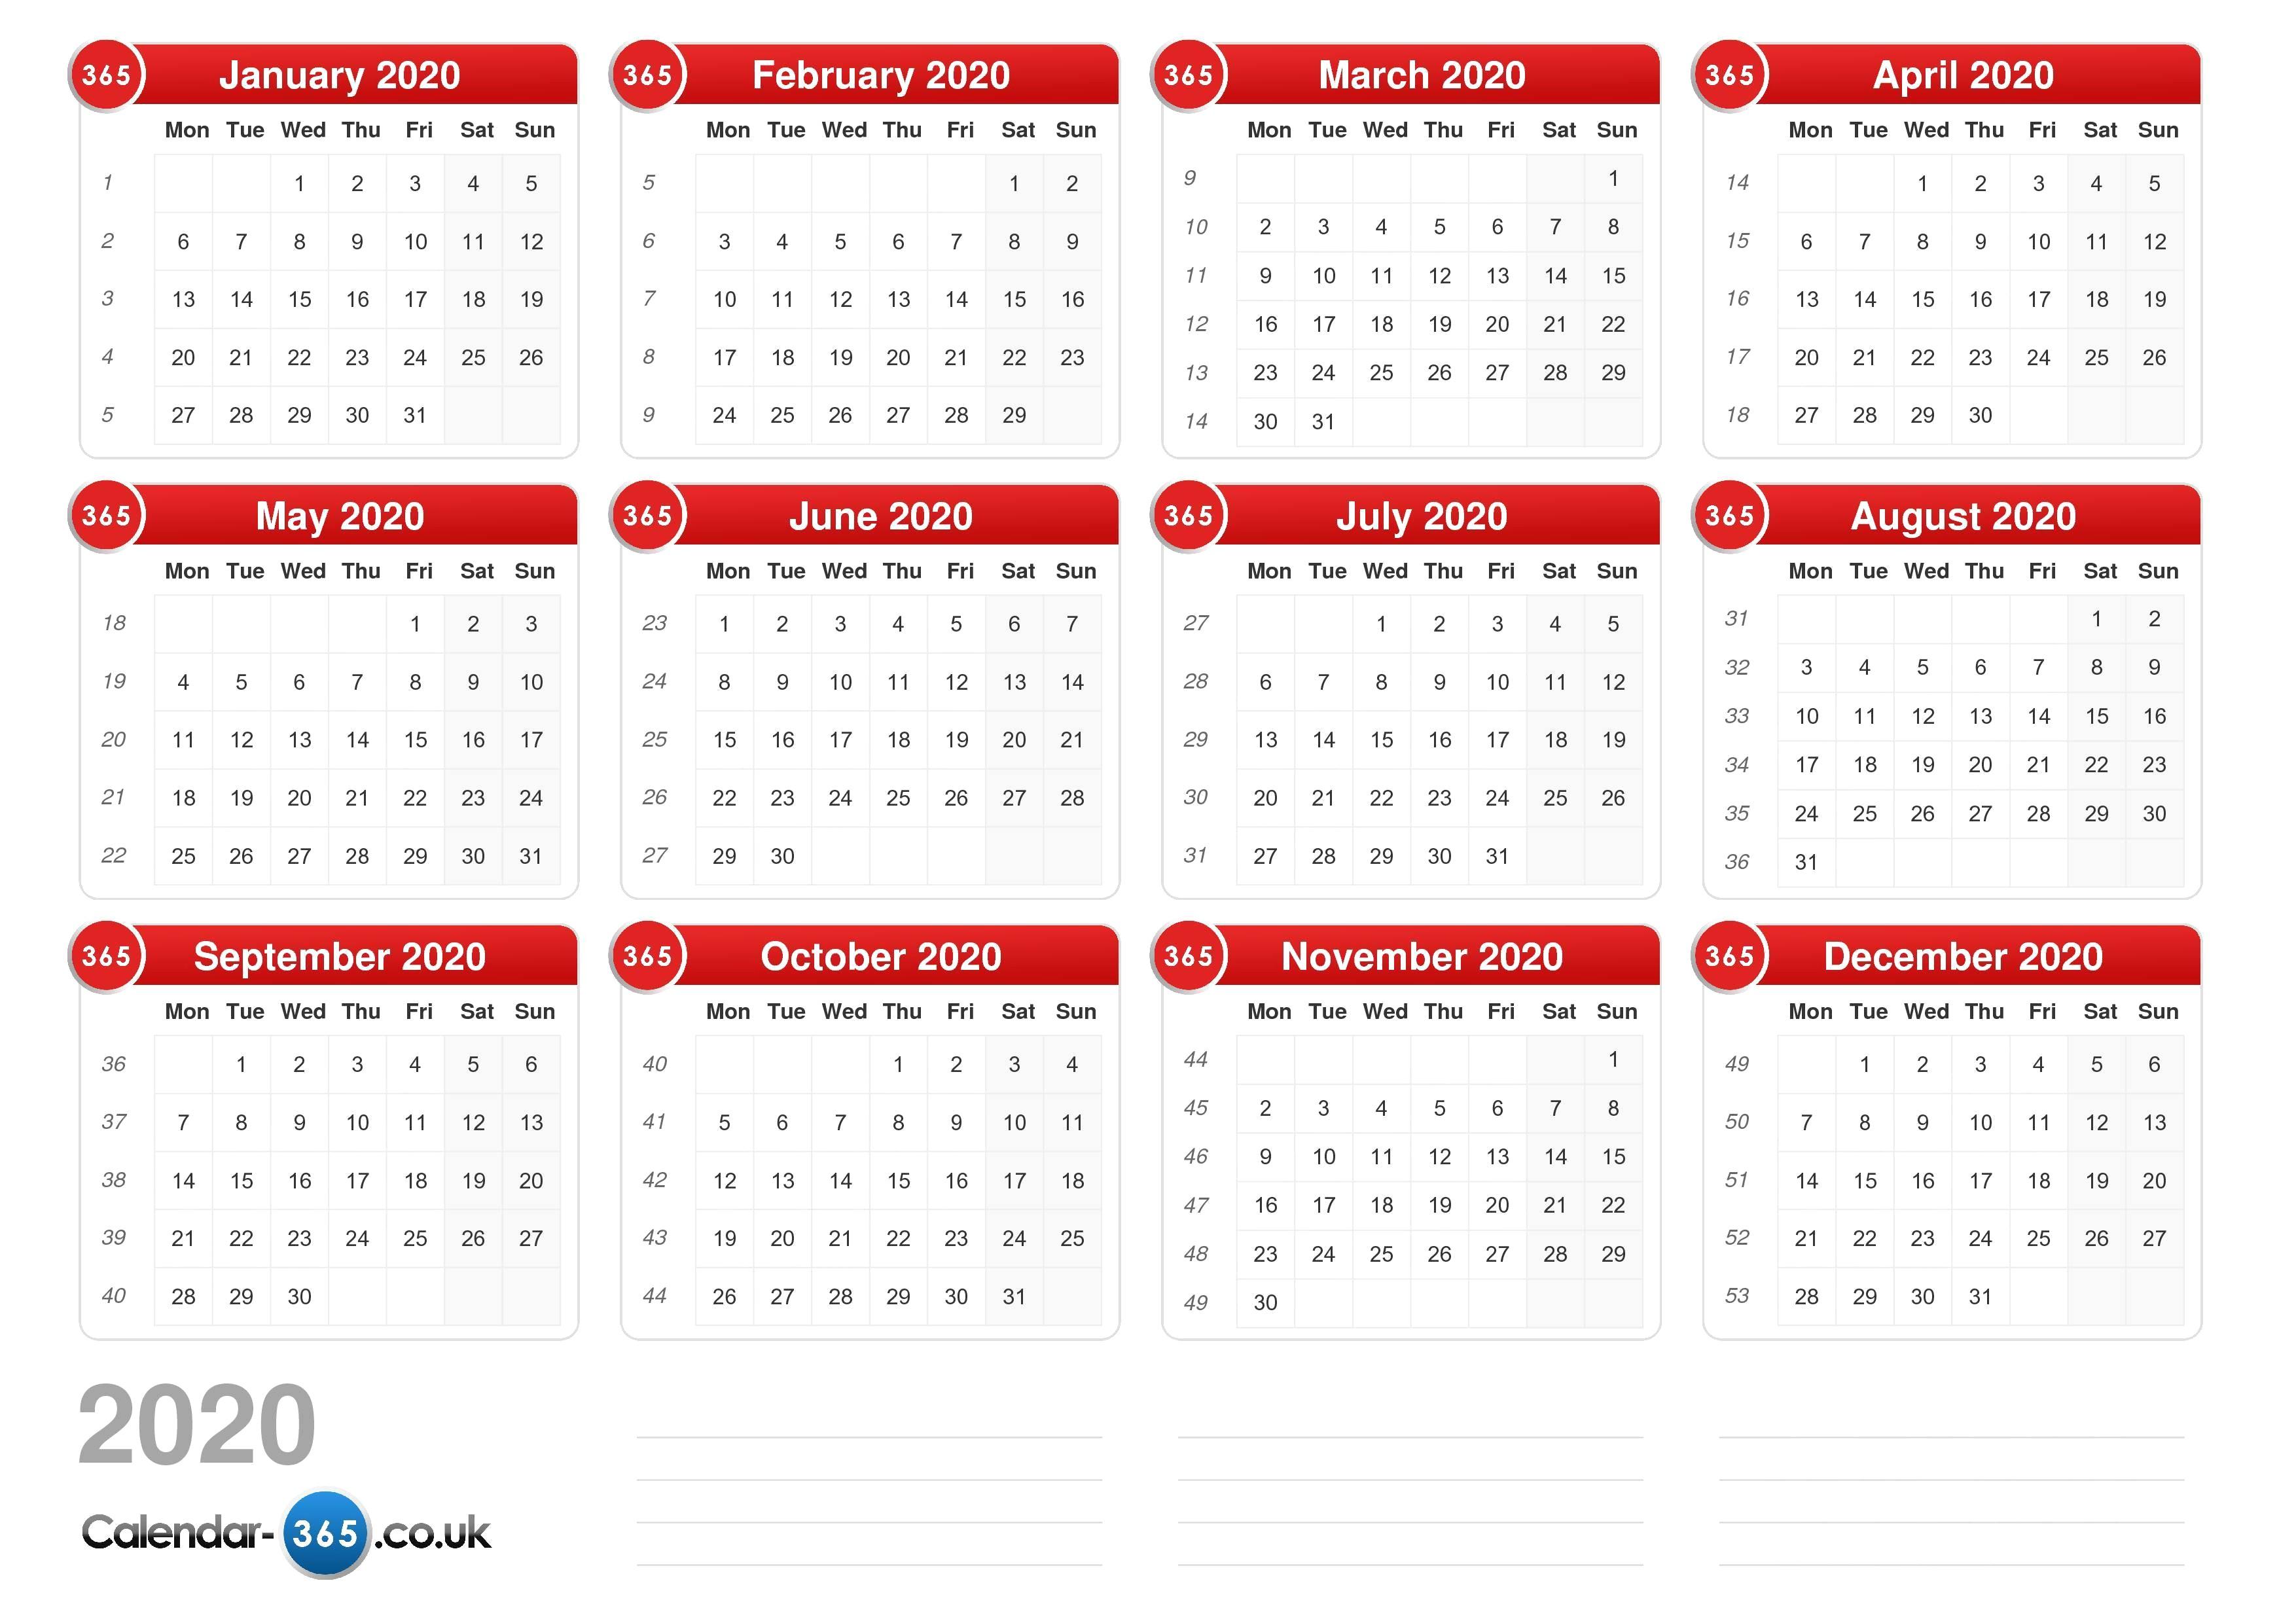 March 2020 Lunar Calendar